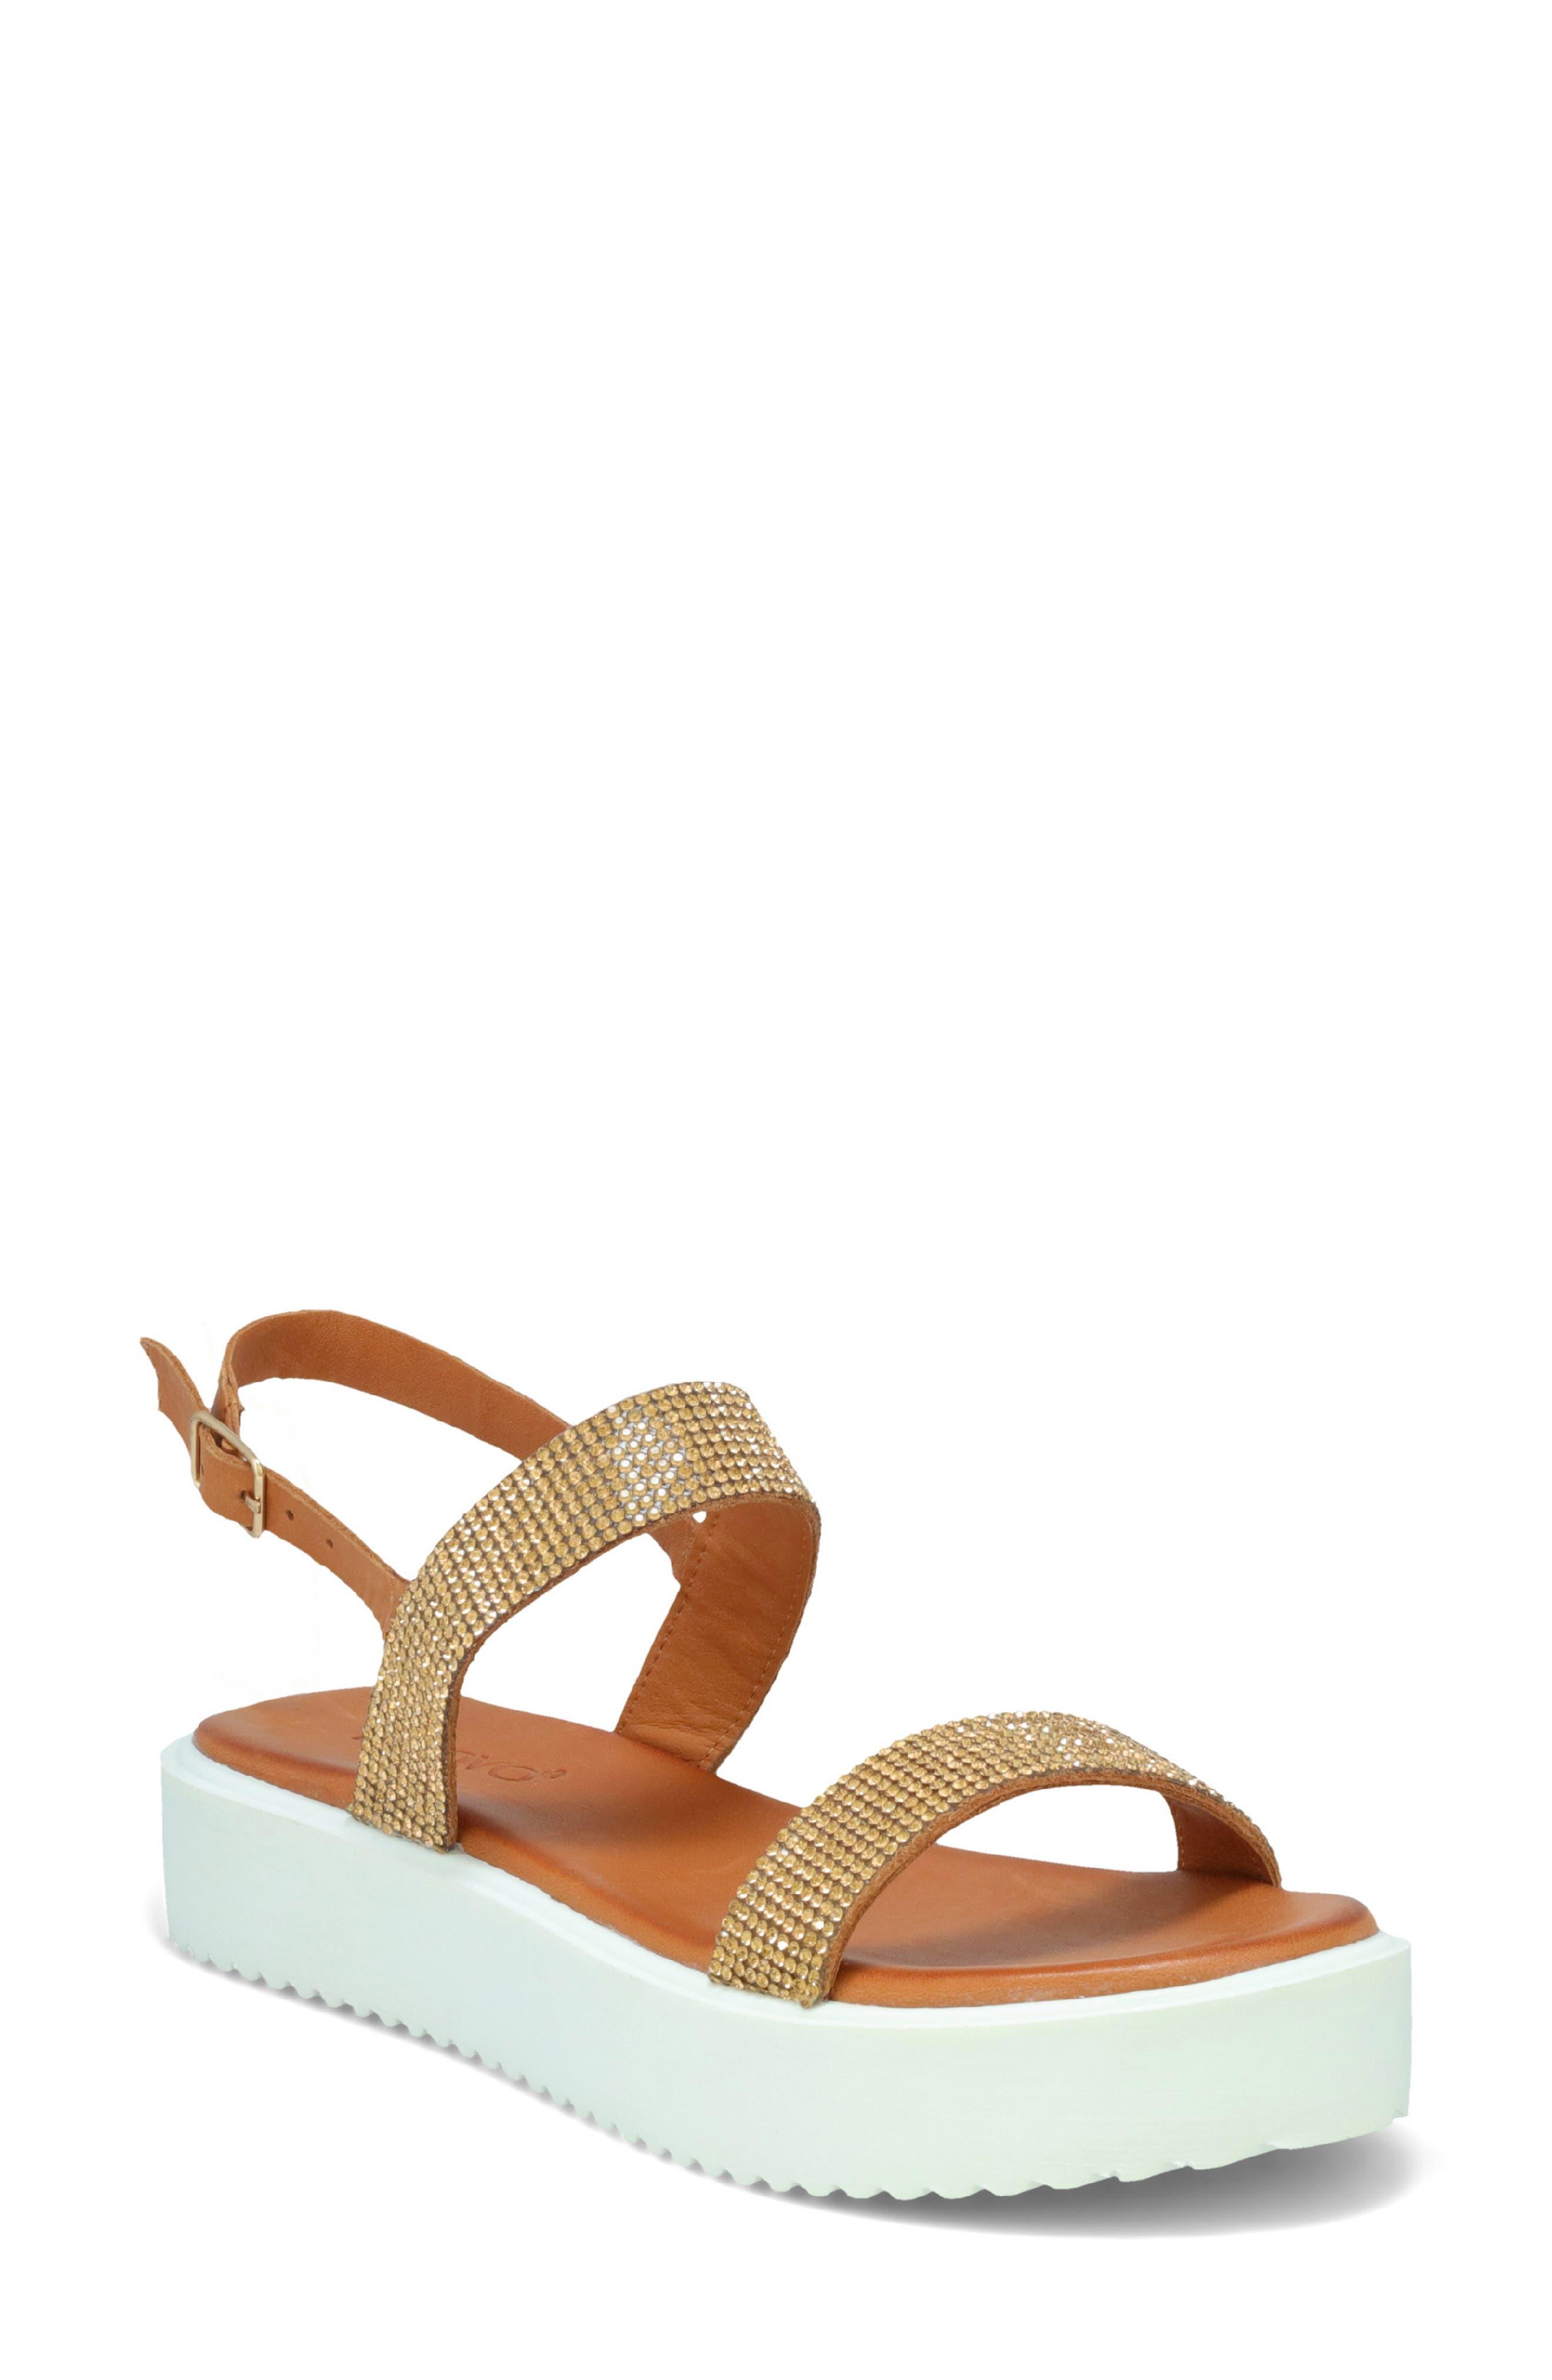 Women's Inuovo Jaden Platform Sandal